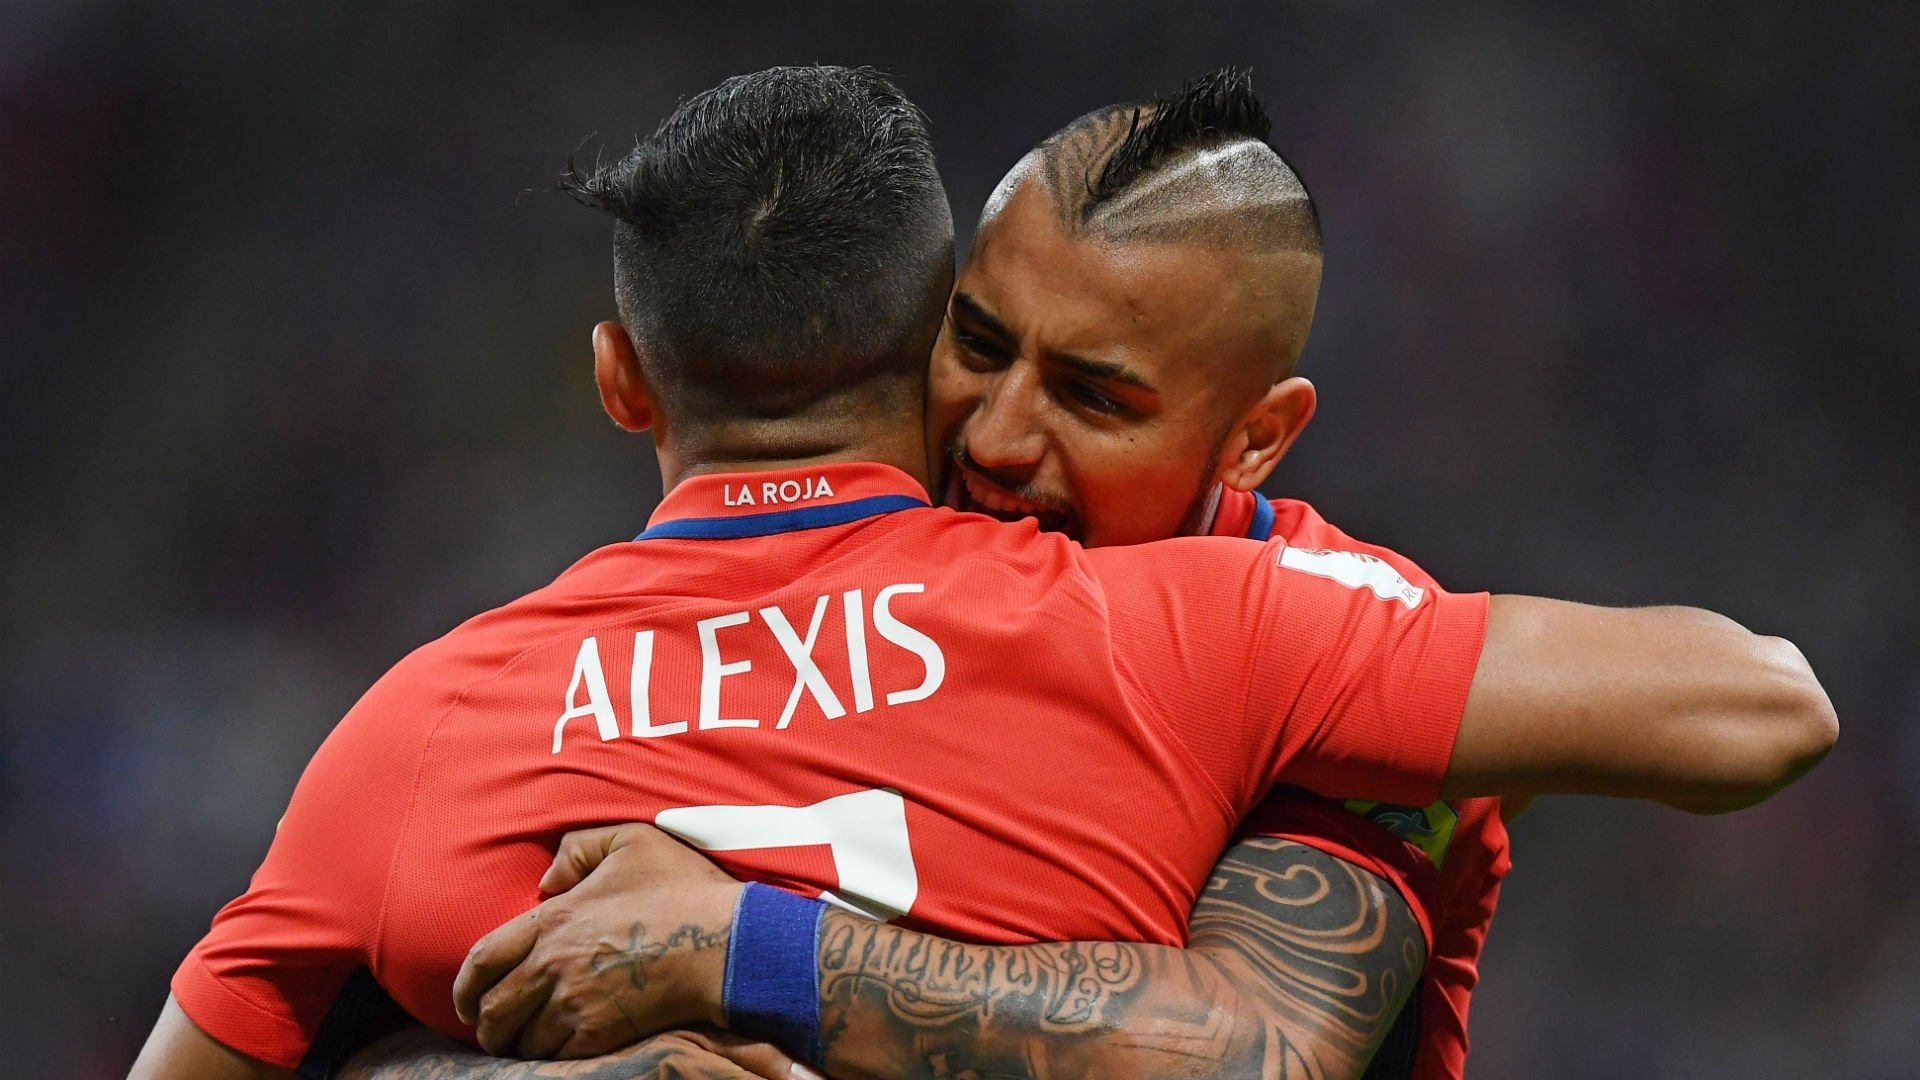 chile to quarantine returning football stars alexis sanchez and arturo vidal